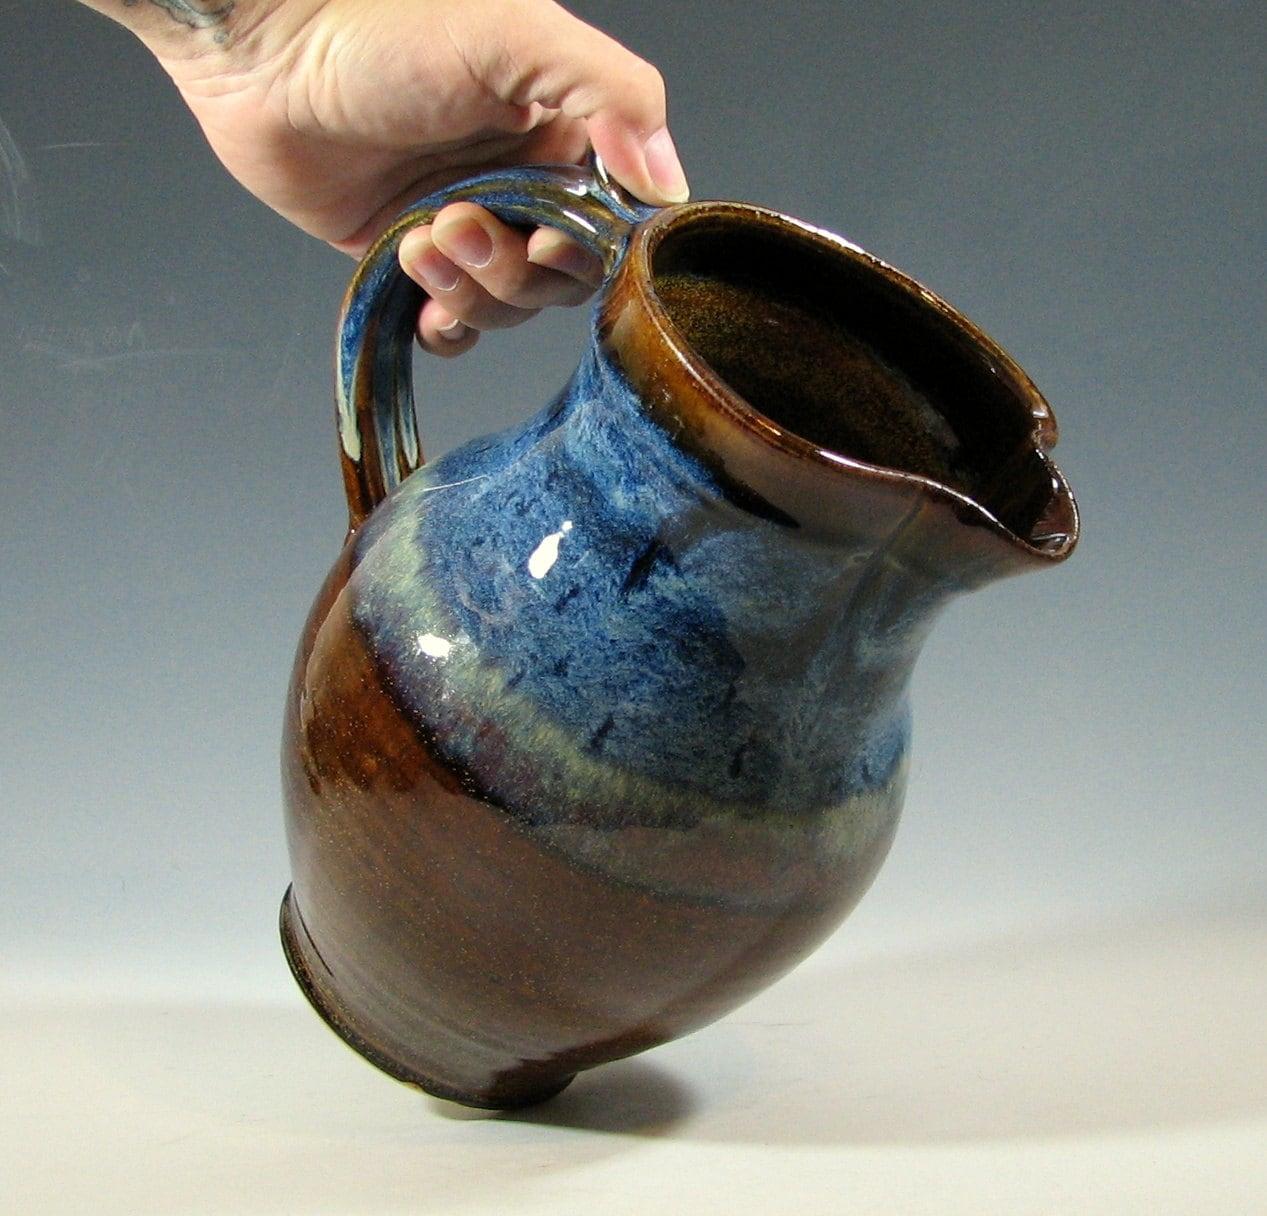 Pitcher Ceramic Jug Drinks Serving Glazed In Brown And Blue